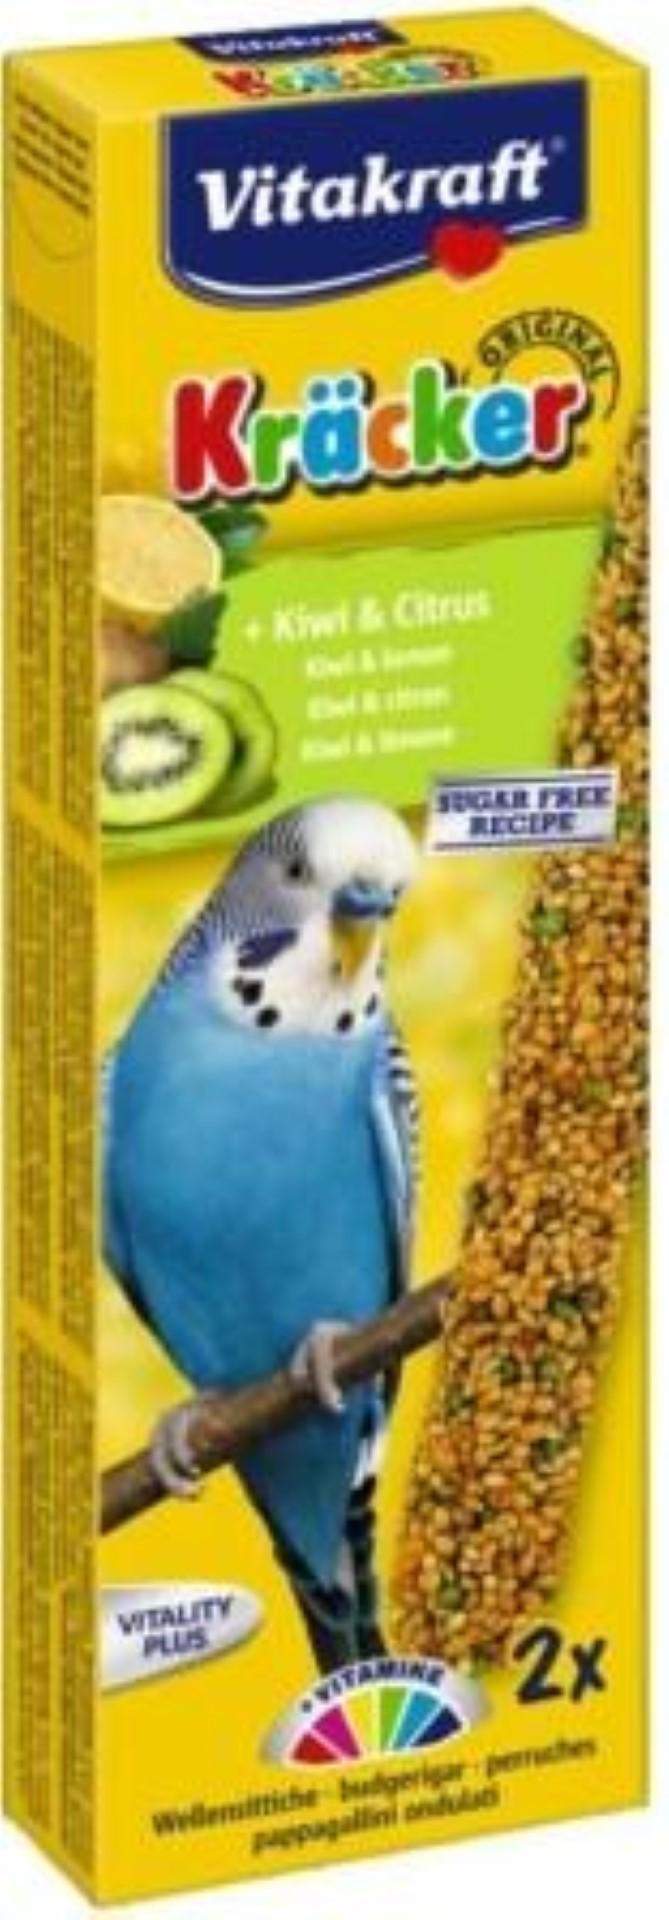 Vitakraft kiwi/citrus-kracker parkiet 2in1